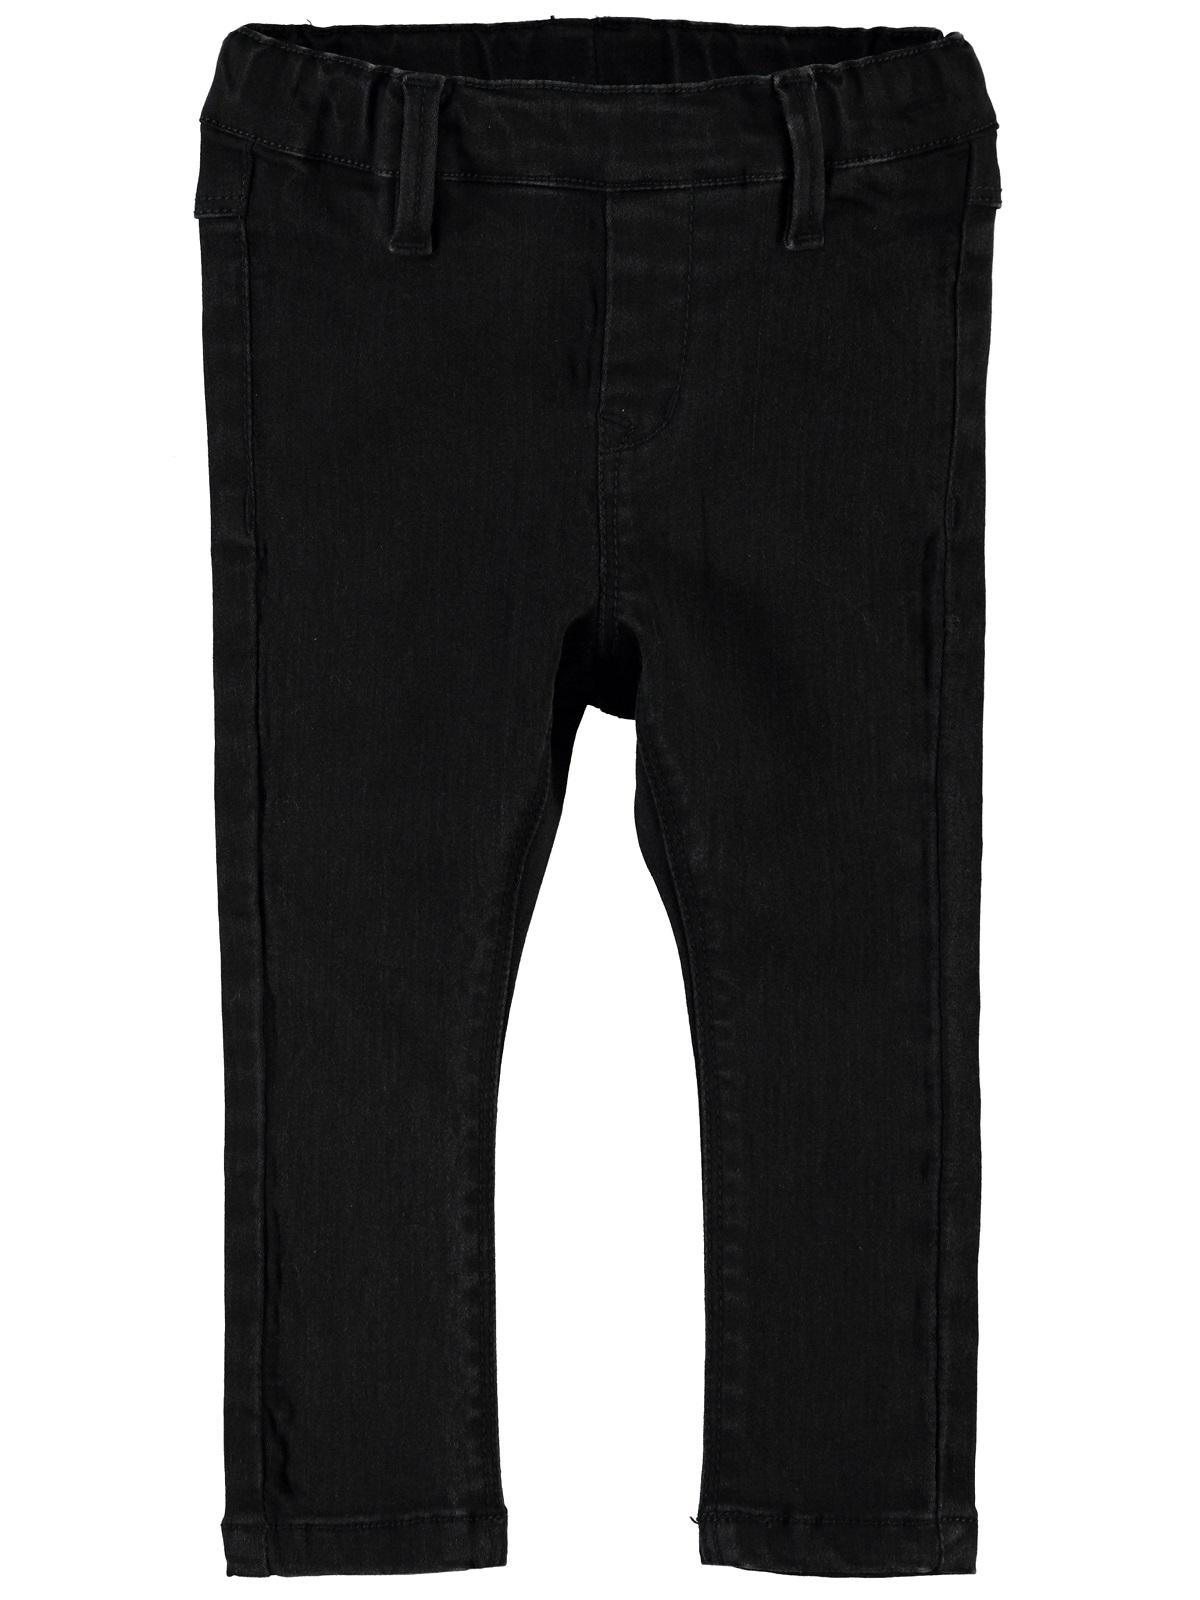 perfekte Qualität großer Rabattverkauf modische Muster Name it Nittea Skinny Dnm Legging MZ 13130547